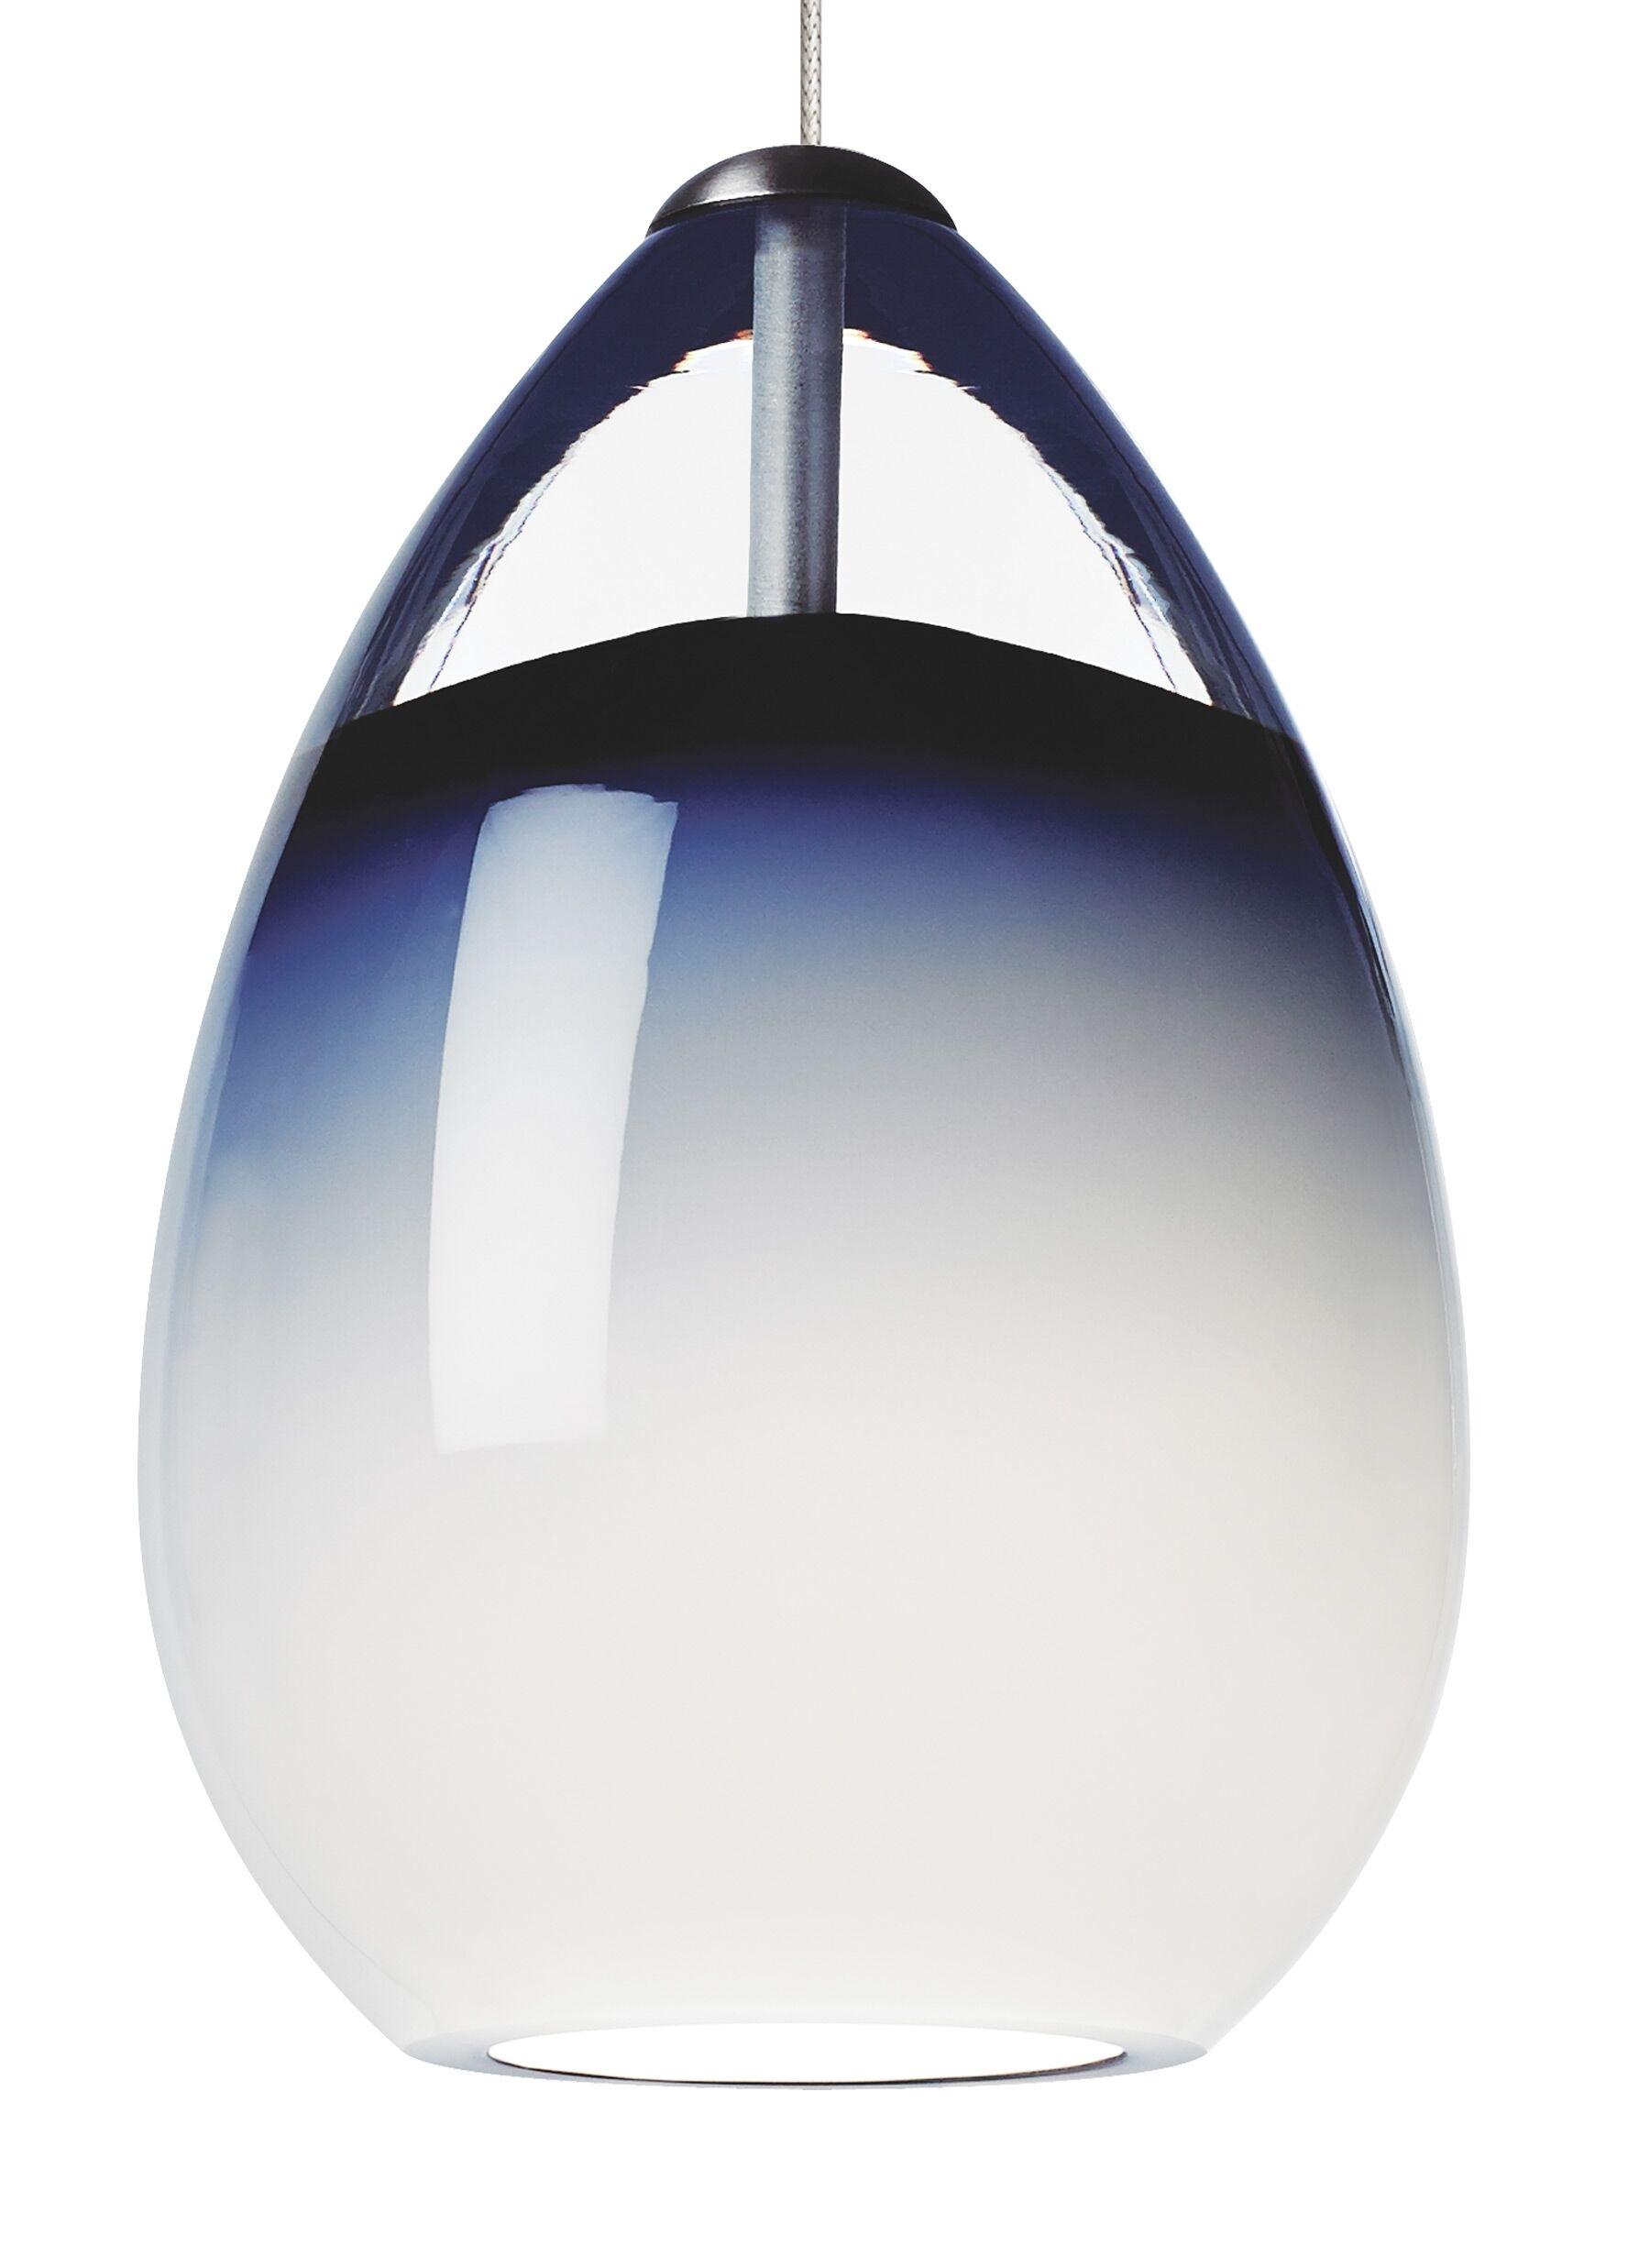 Alina 1 Light Track Pendant Finish: Satin Nickel, Shade Color: Smoke, Mounting Type: Monorail